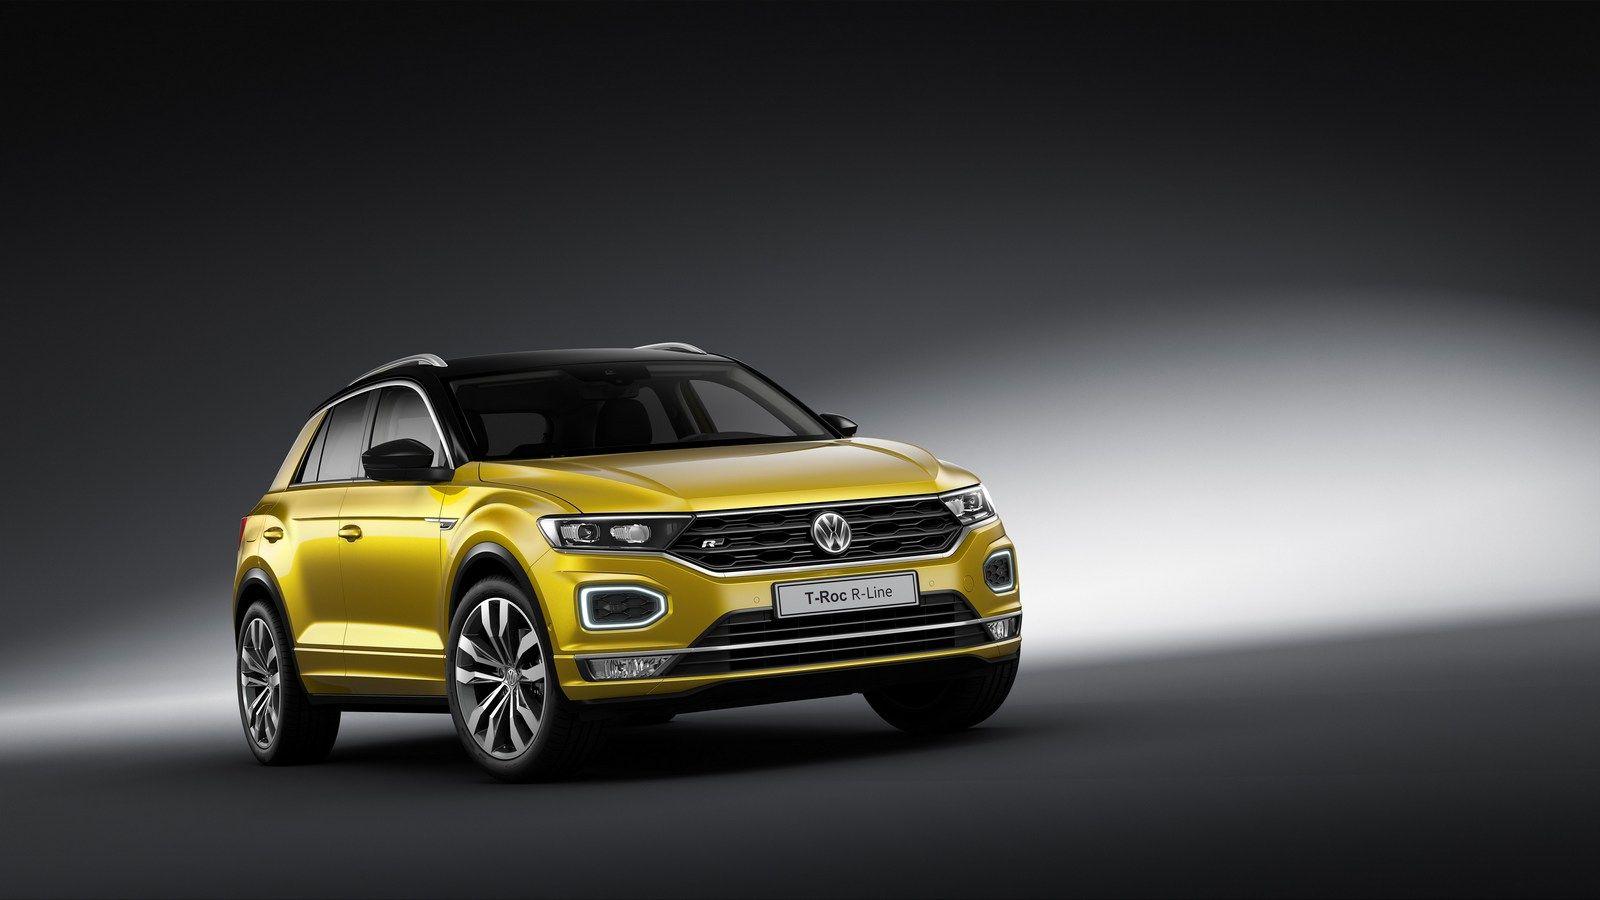 Vw T Roc Puts On Sporty R Line Ensemble For Frankfurt Carscoops Volkswagen Volkswagen Car Large Luggage